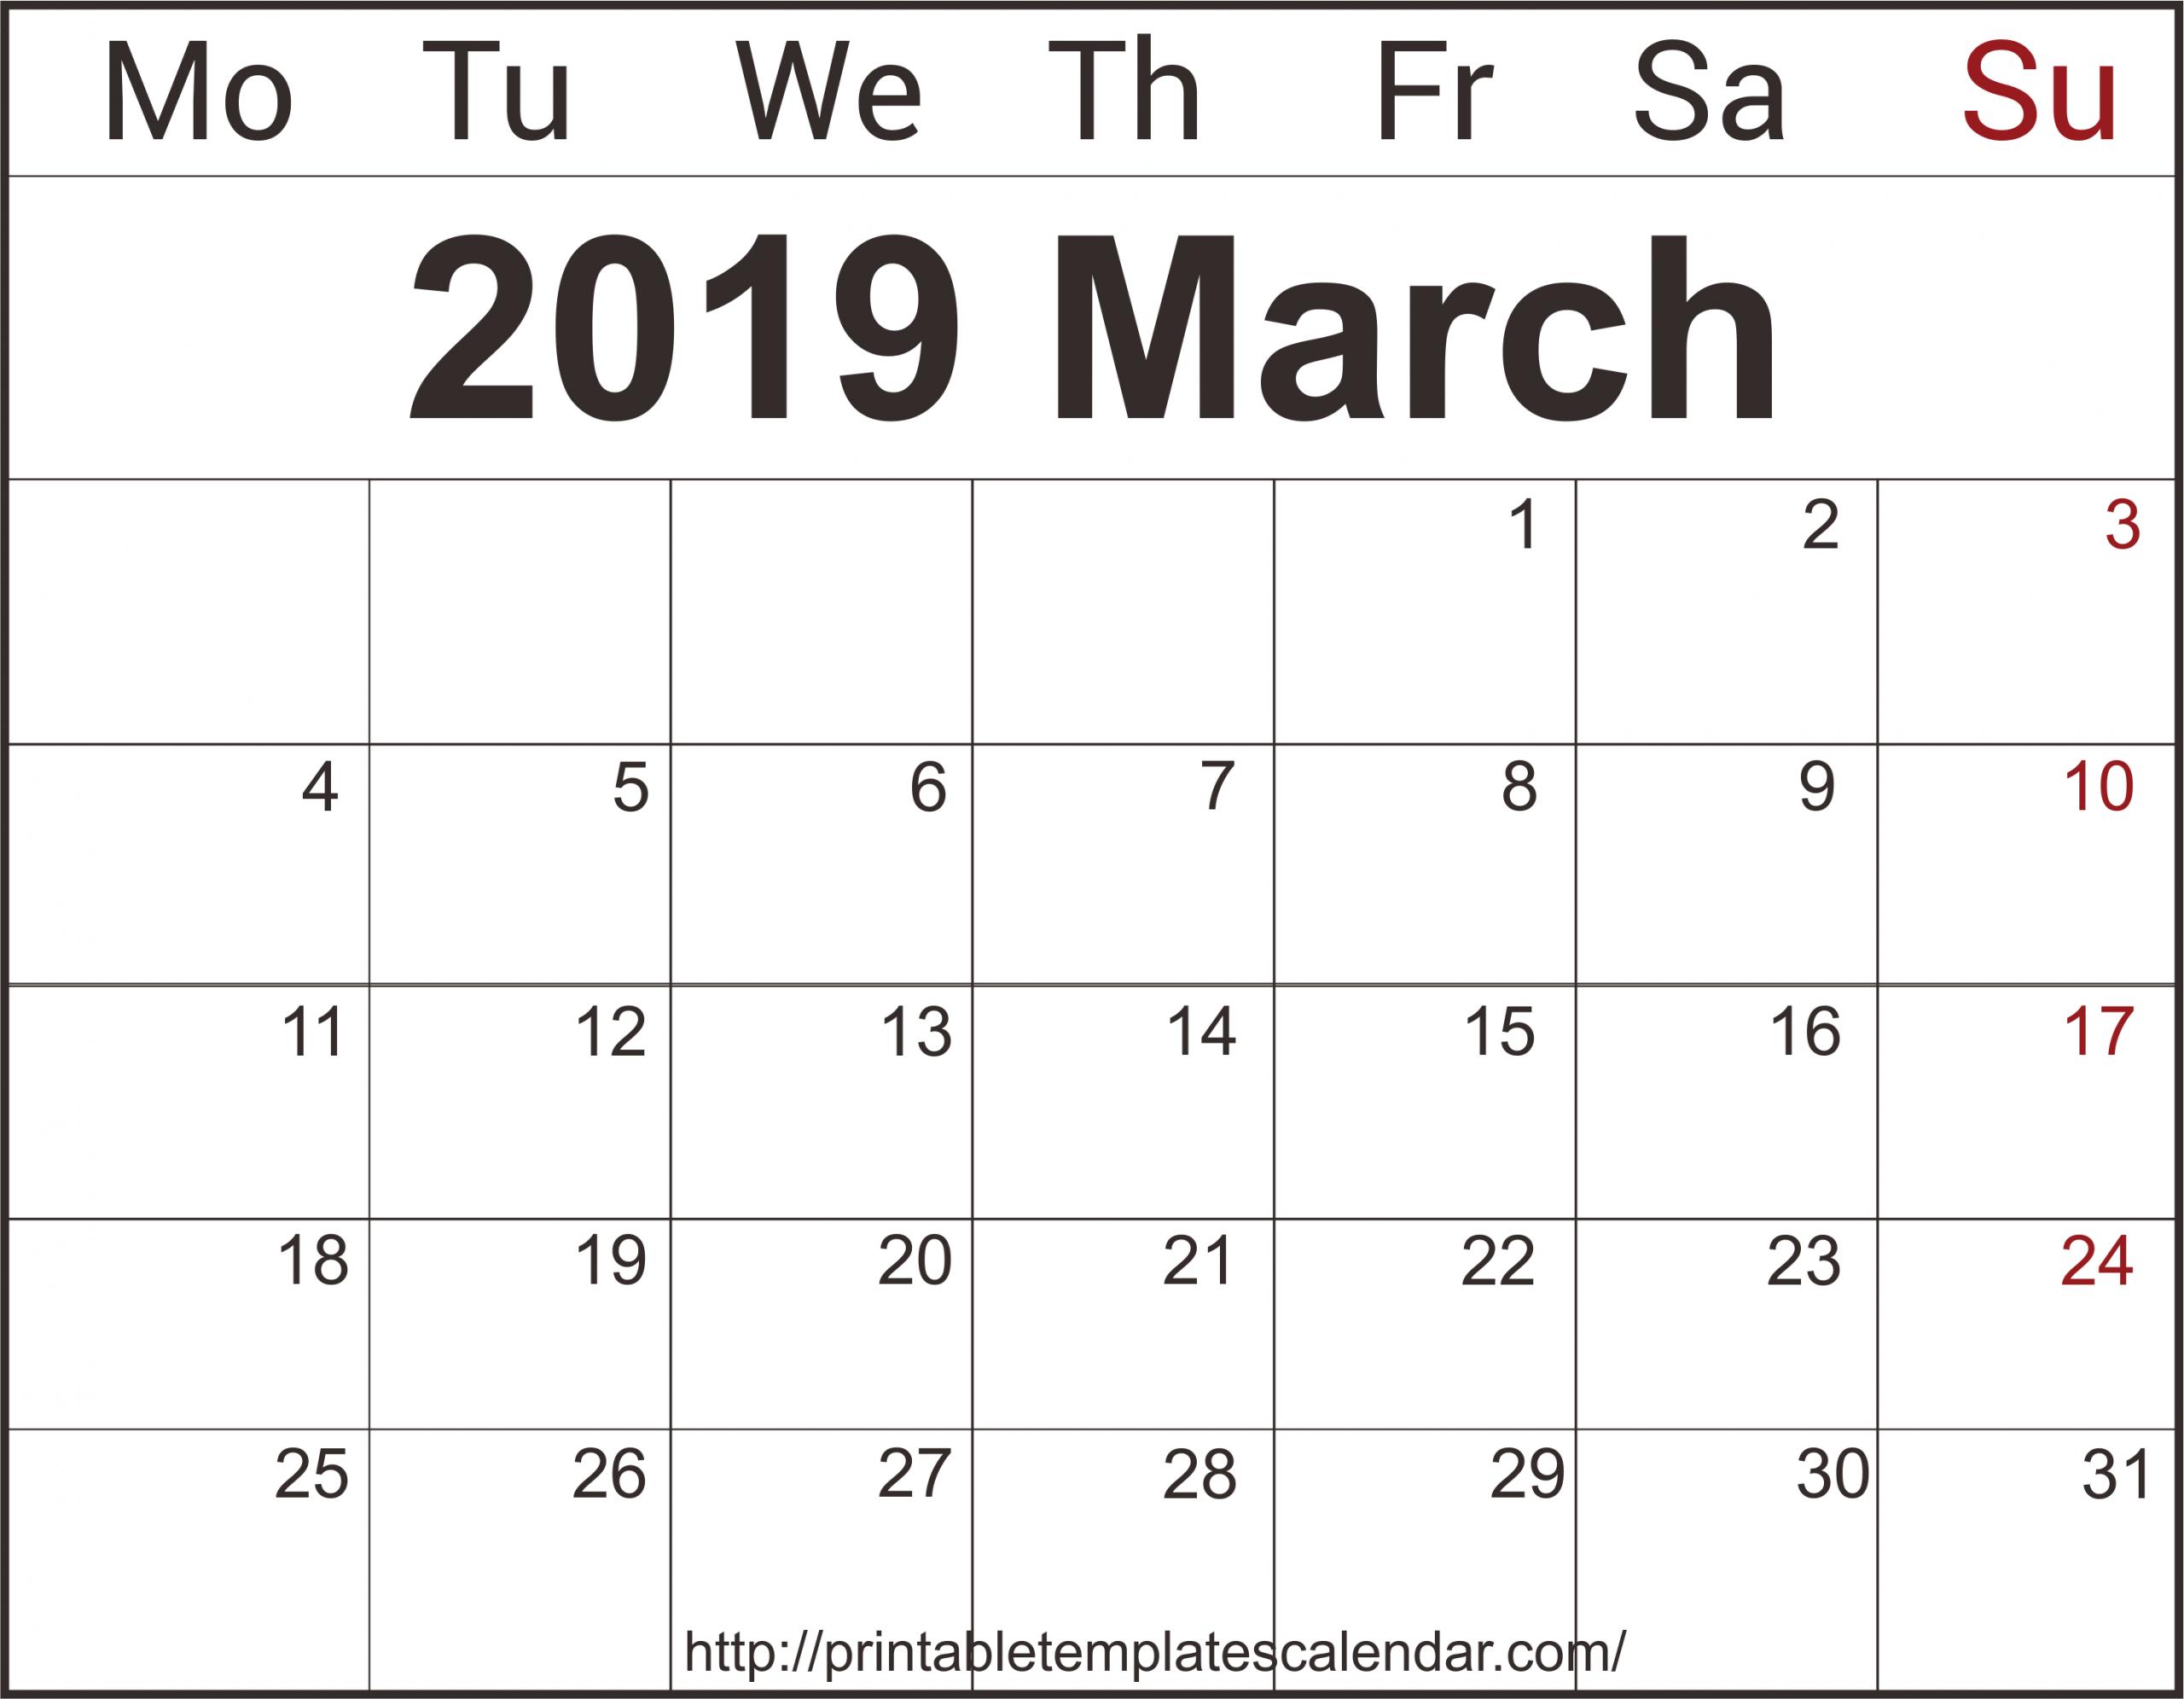 Free March 2019 Printable Calendar Templates Pdf Excel